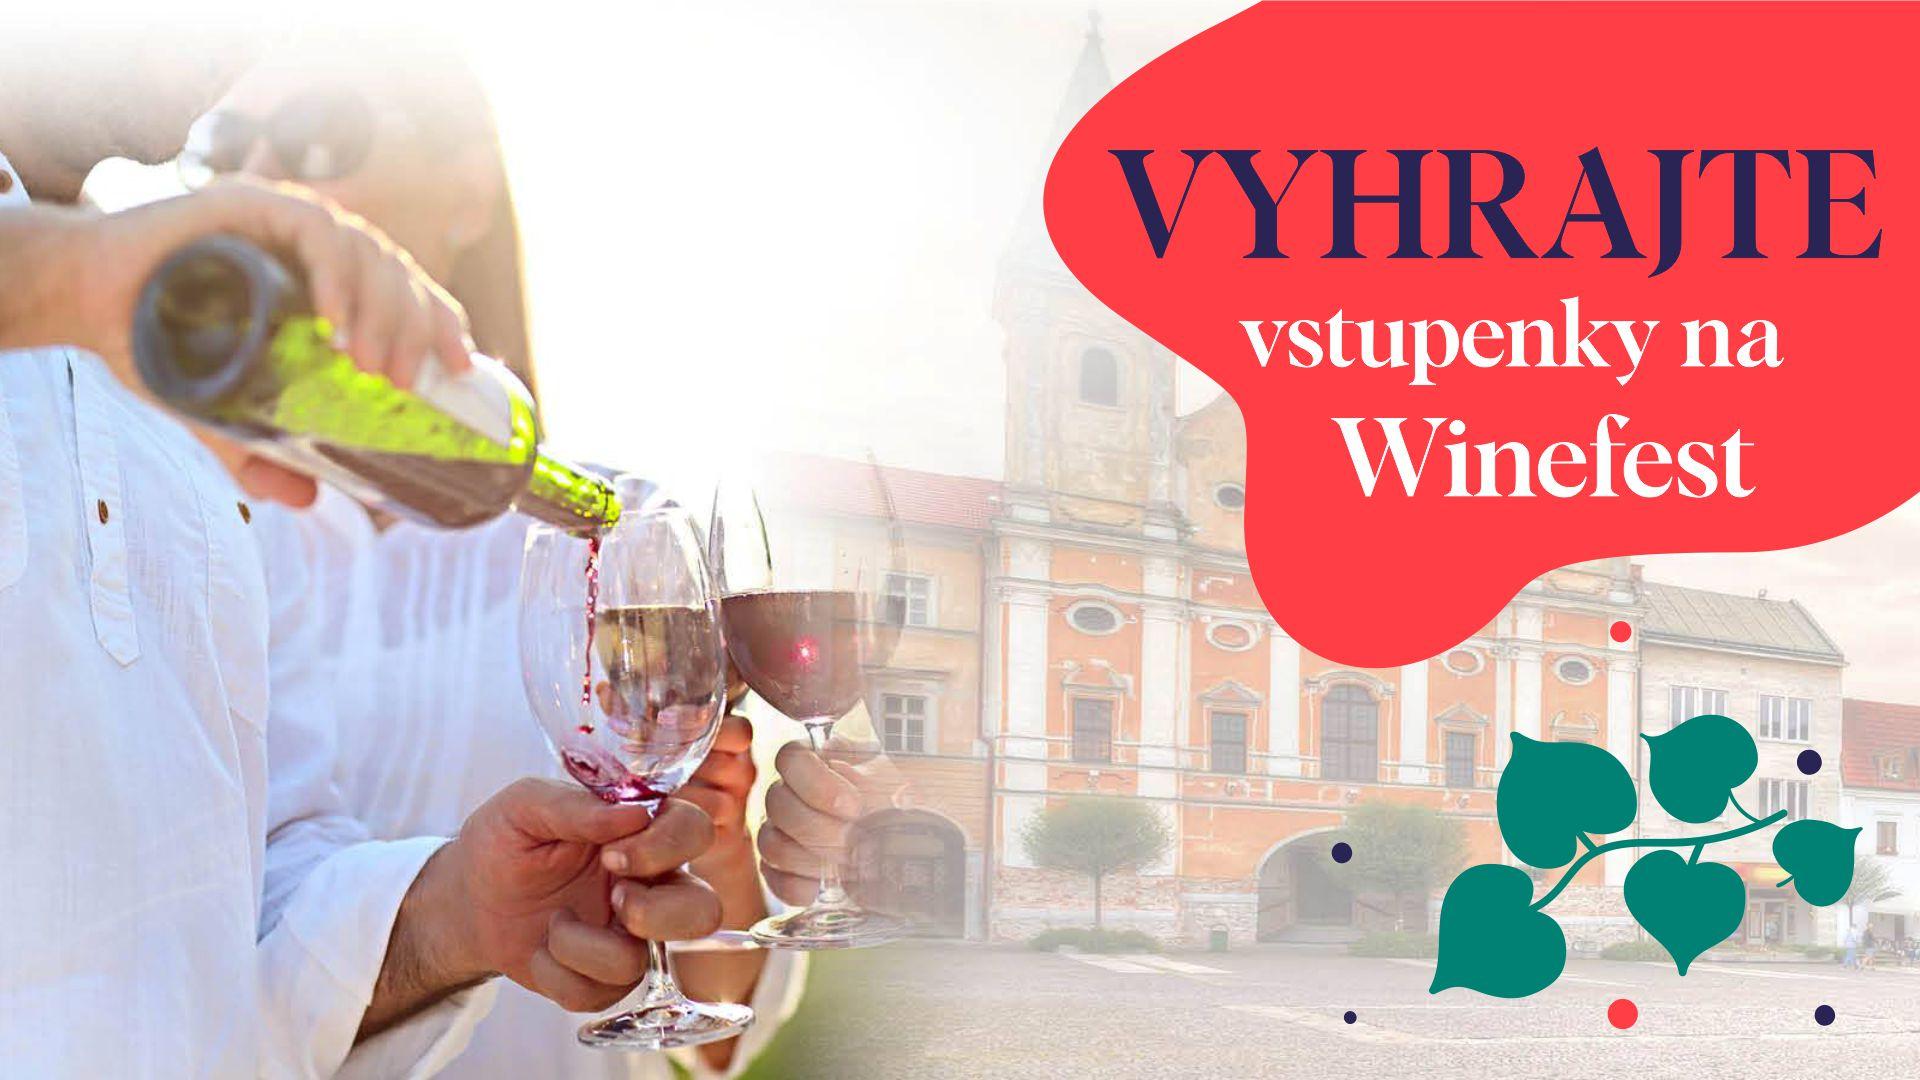 fb sutaz winefest - Súťaže